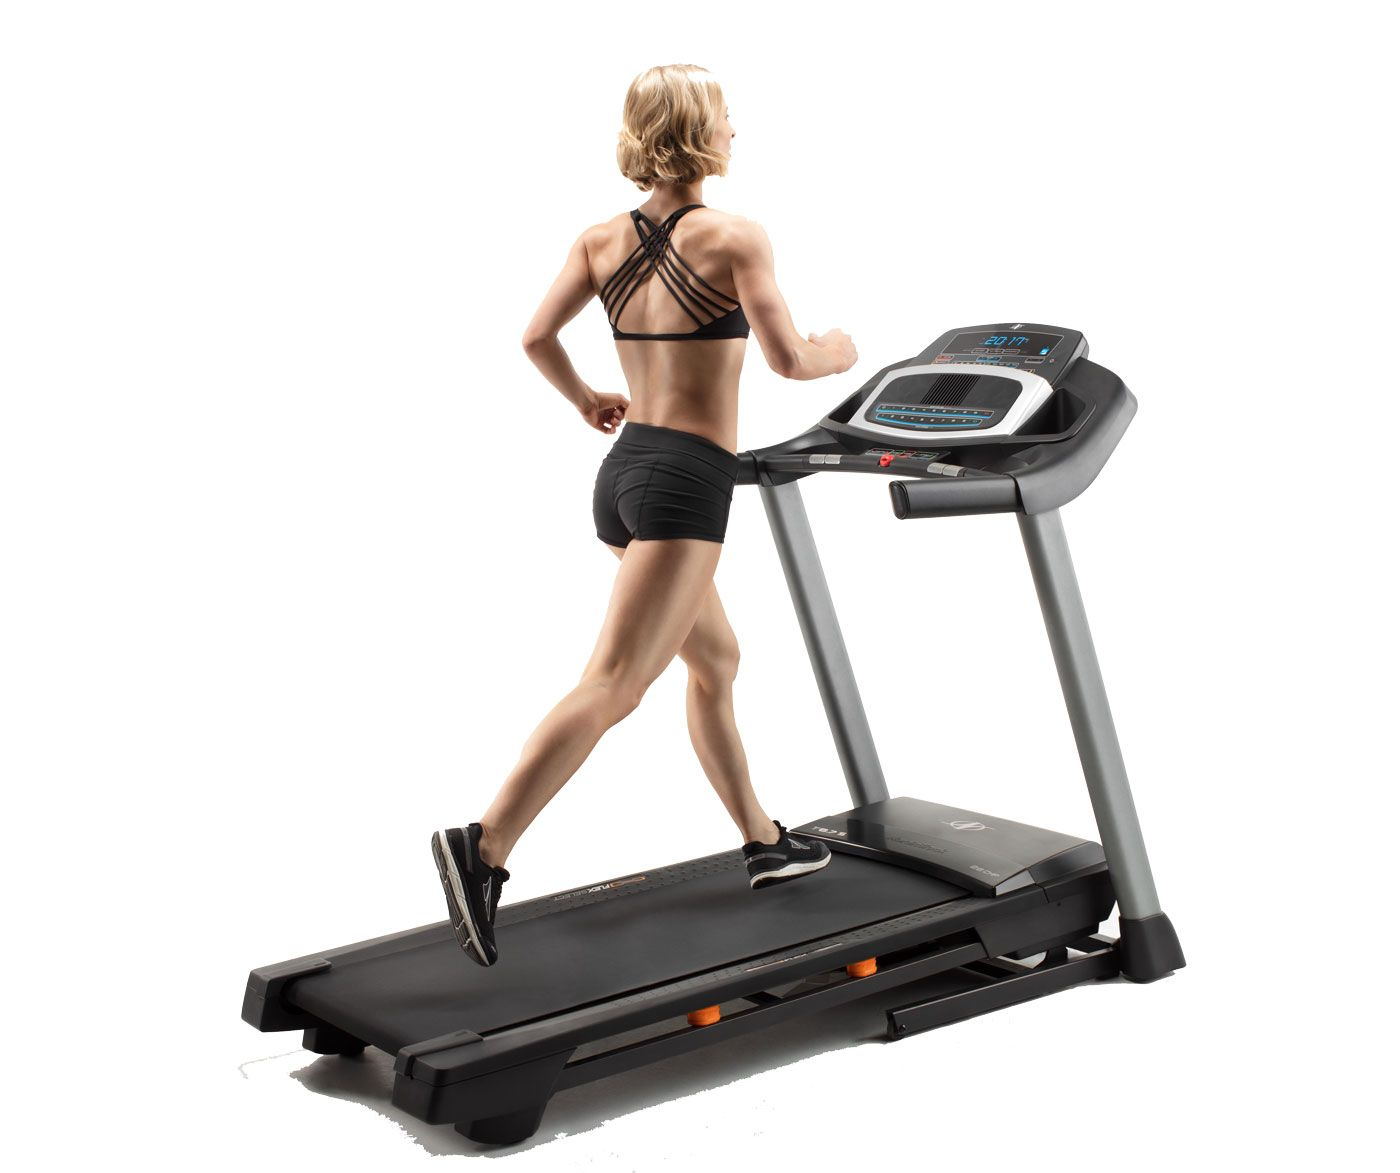 NordicTrack T 6.7 S Treadmill